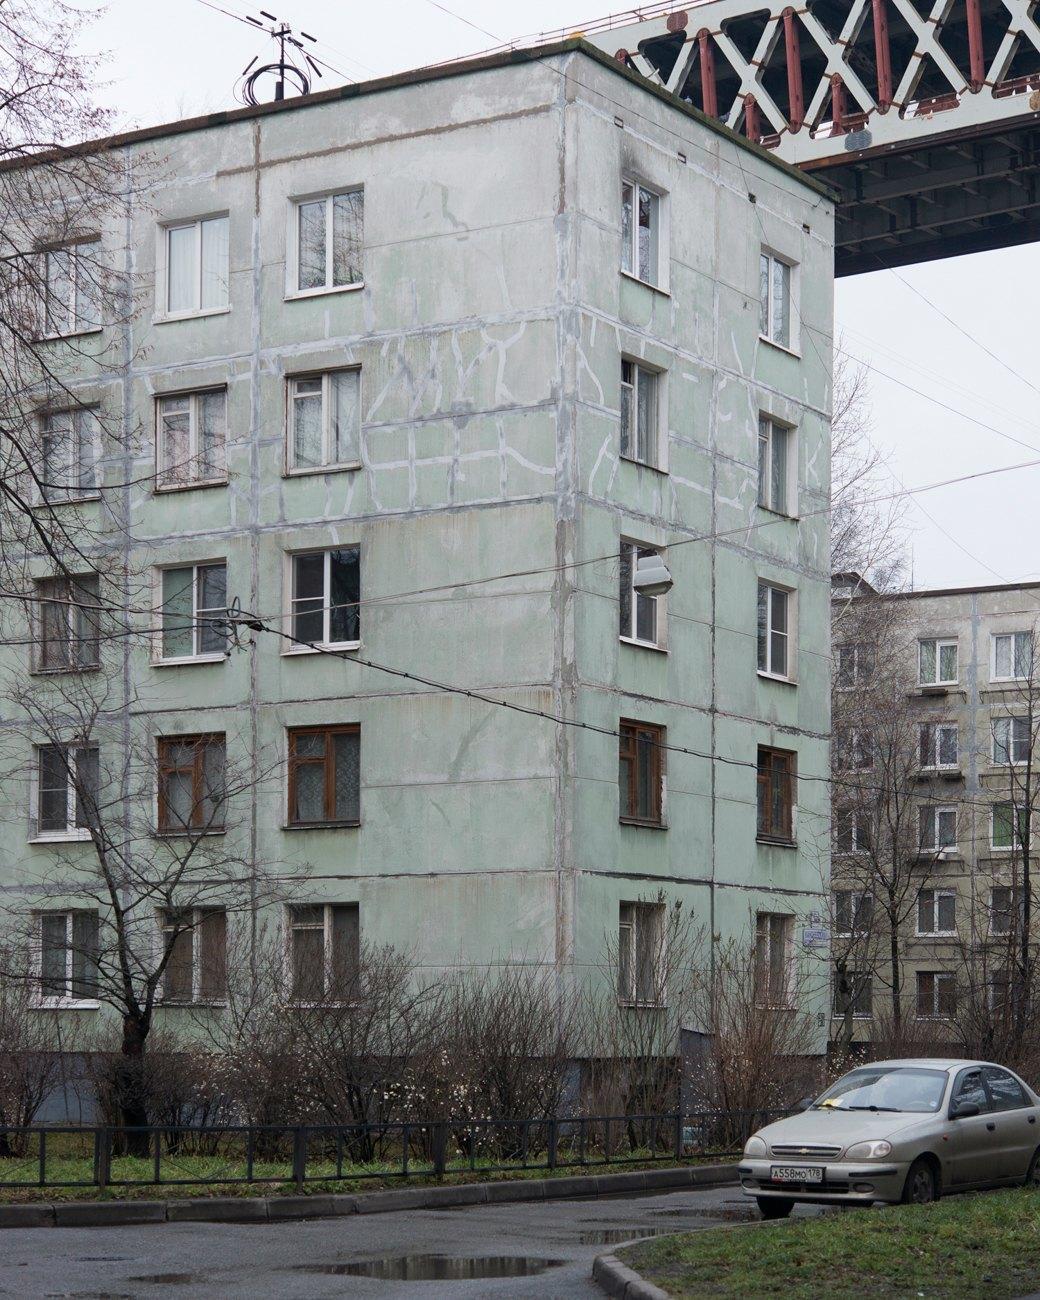 Арест на дом Людмилина улица автоюрист Воронеж Яблочный переулок